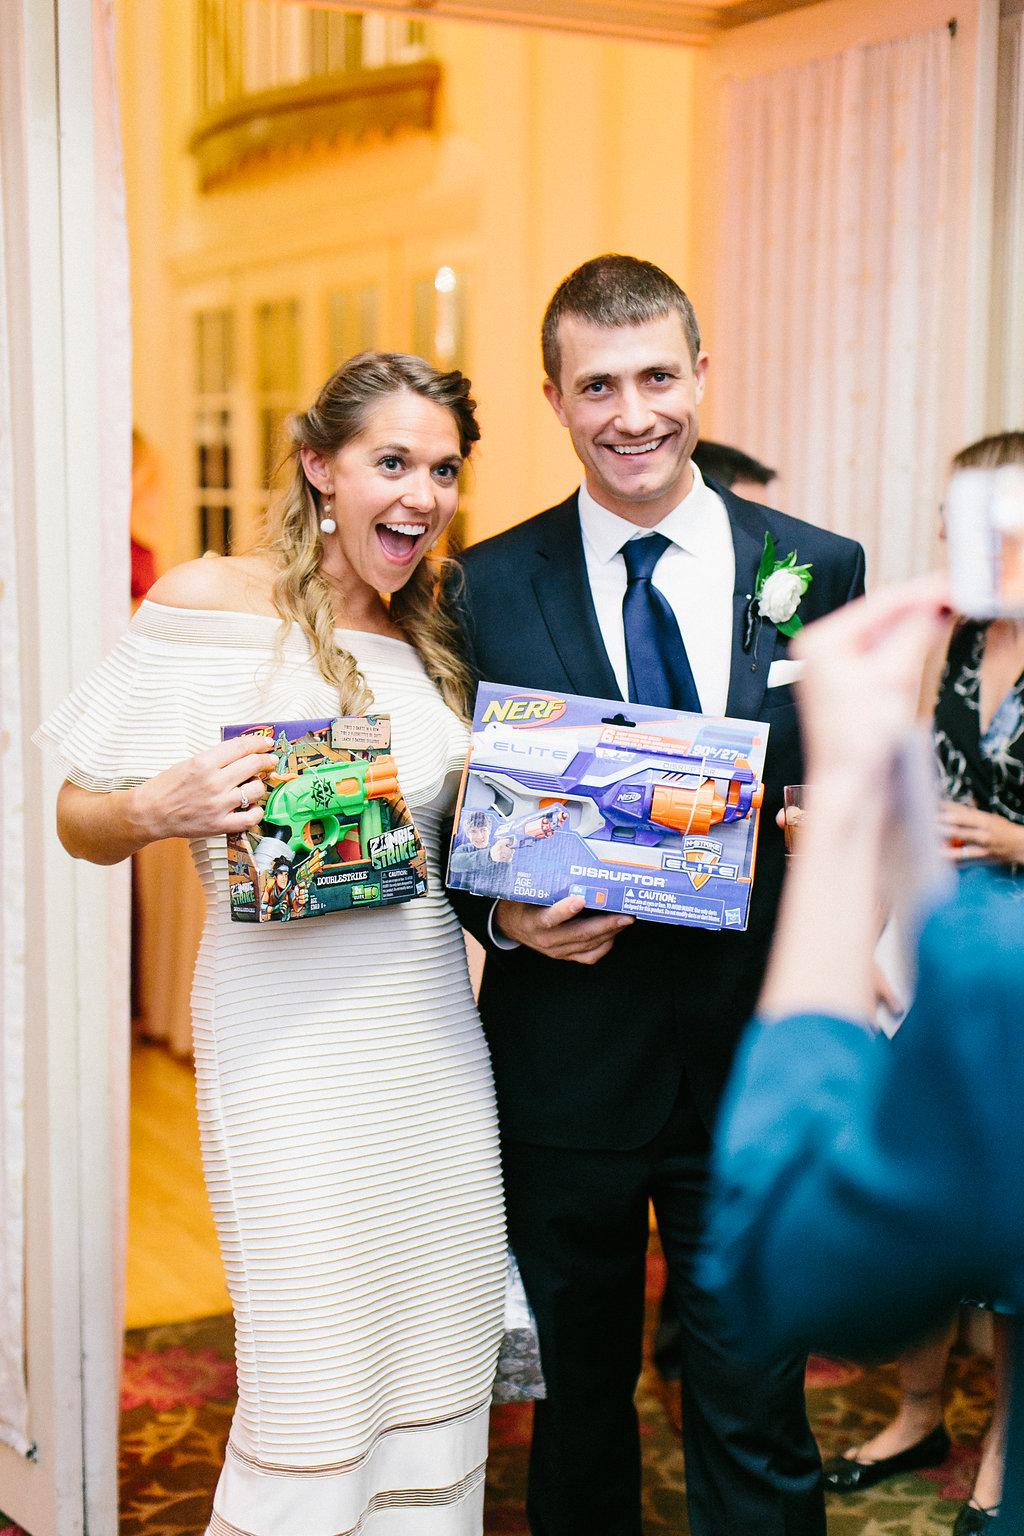 2017_Carly_Milbrath_Backyard_Wedding_Wayzata_MN_705-2.JPG